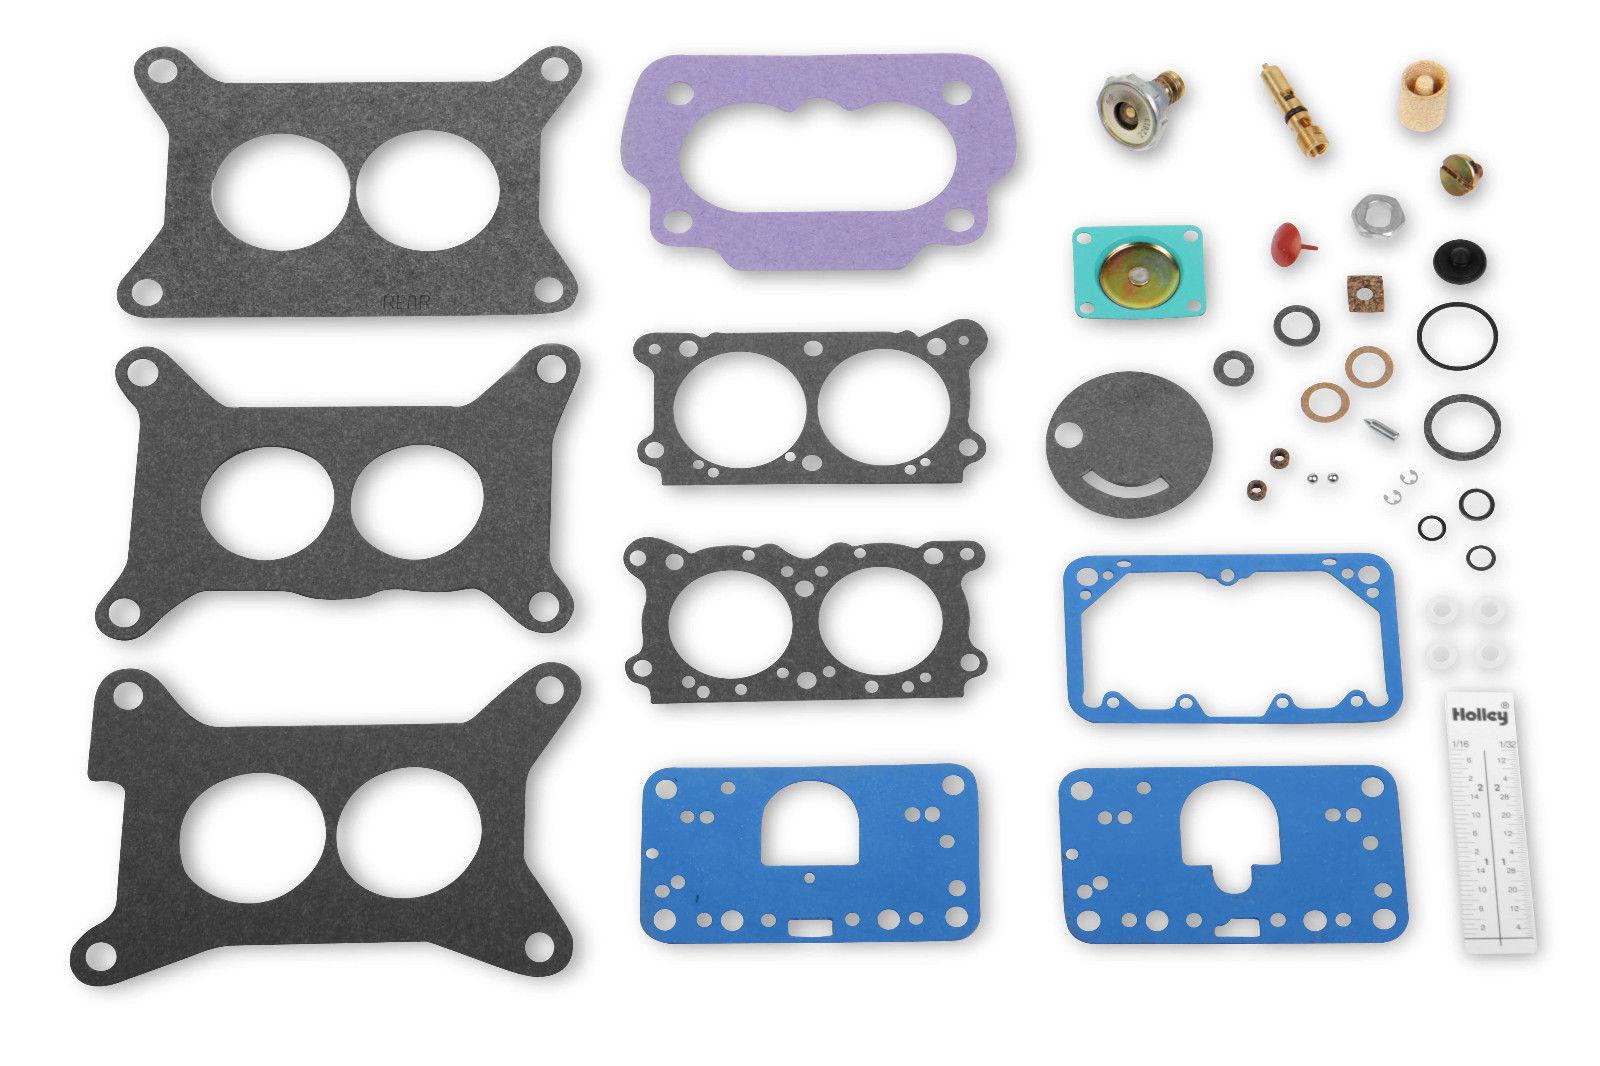 Holley Marine Carburetor Renew Kit 703-41 Fits R80313 R80316 R80321 R80385